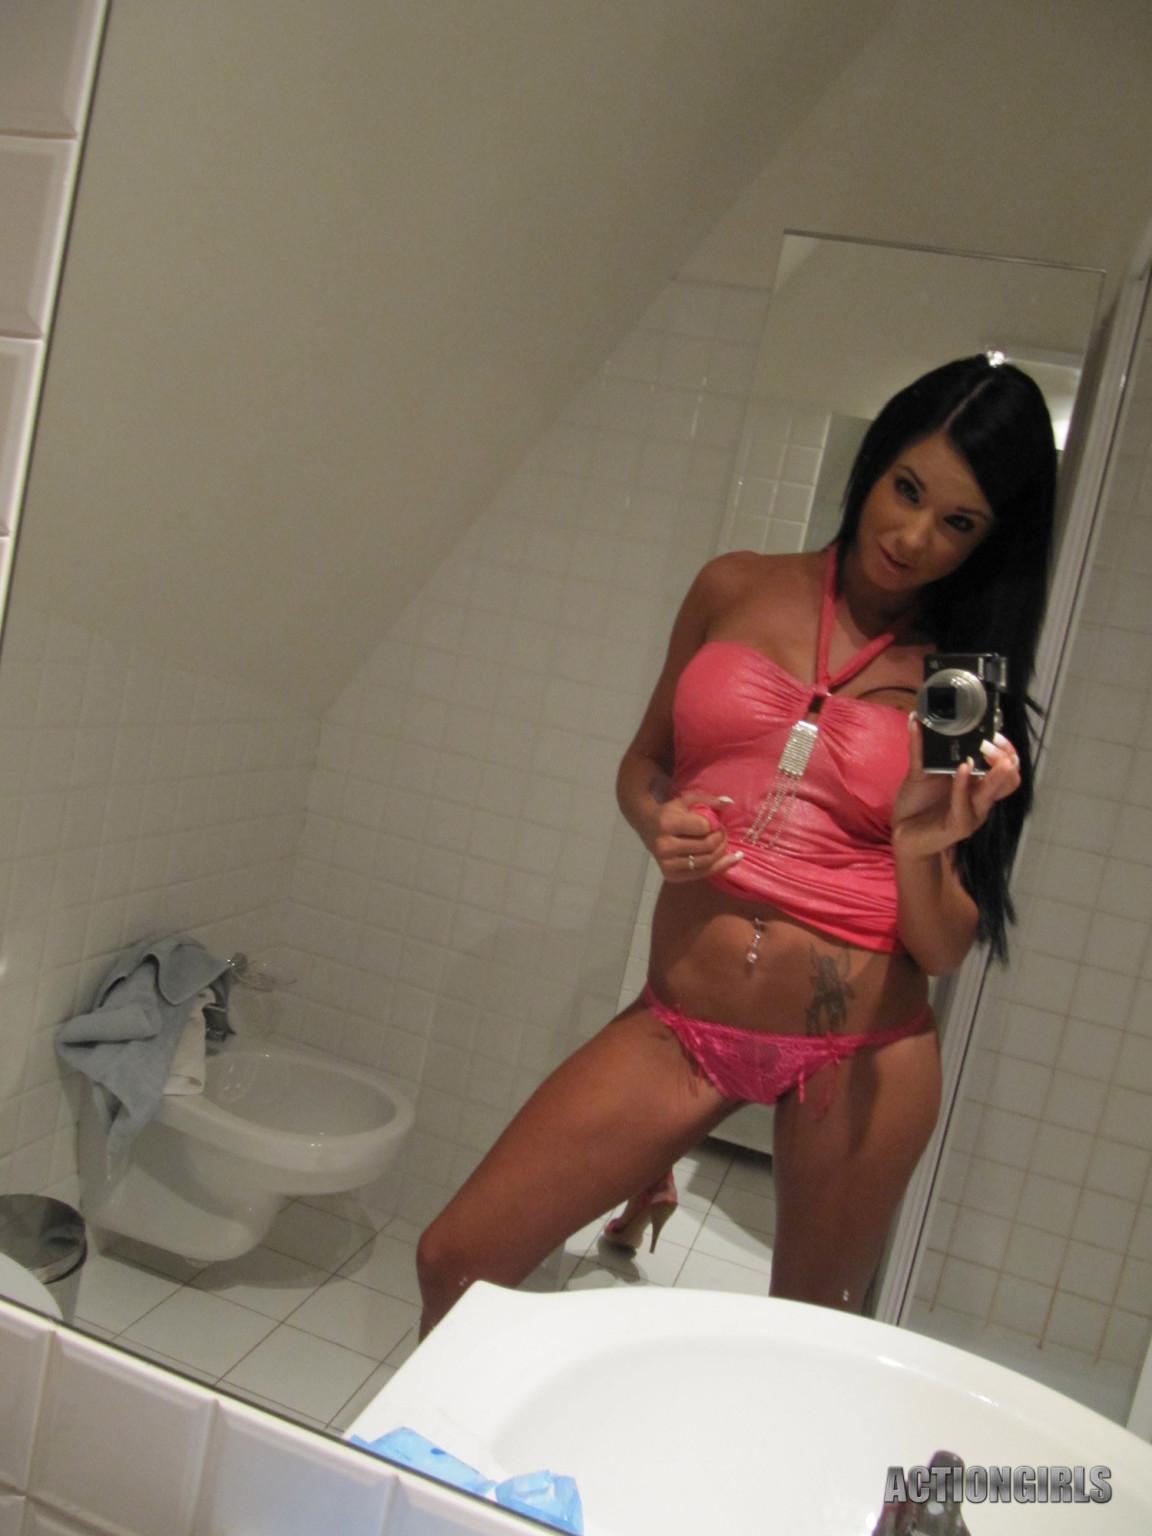 Ashley Bulgari - В ванной - Порно галерея № 3455159